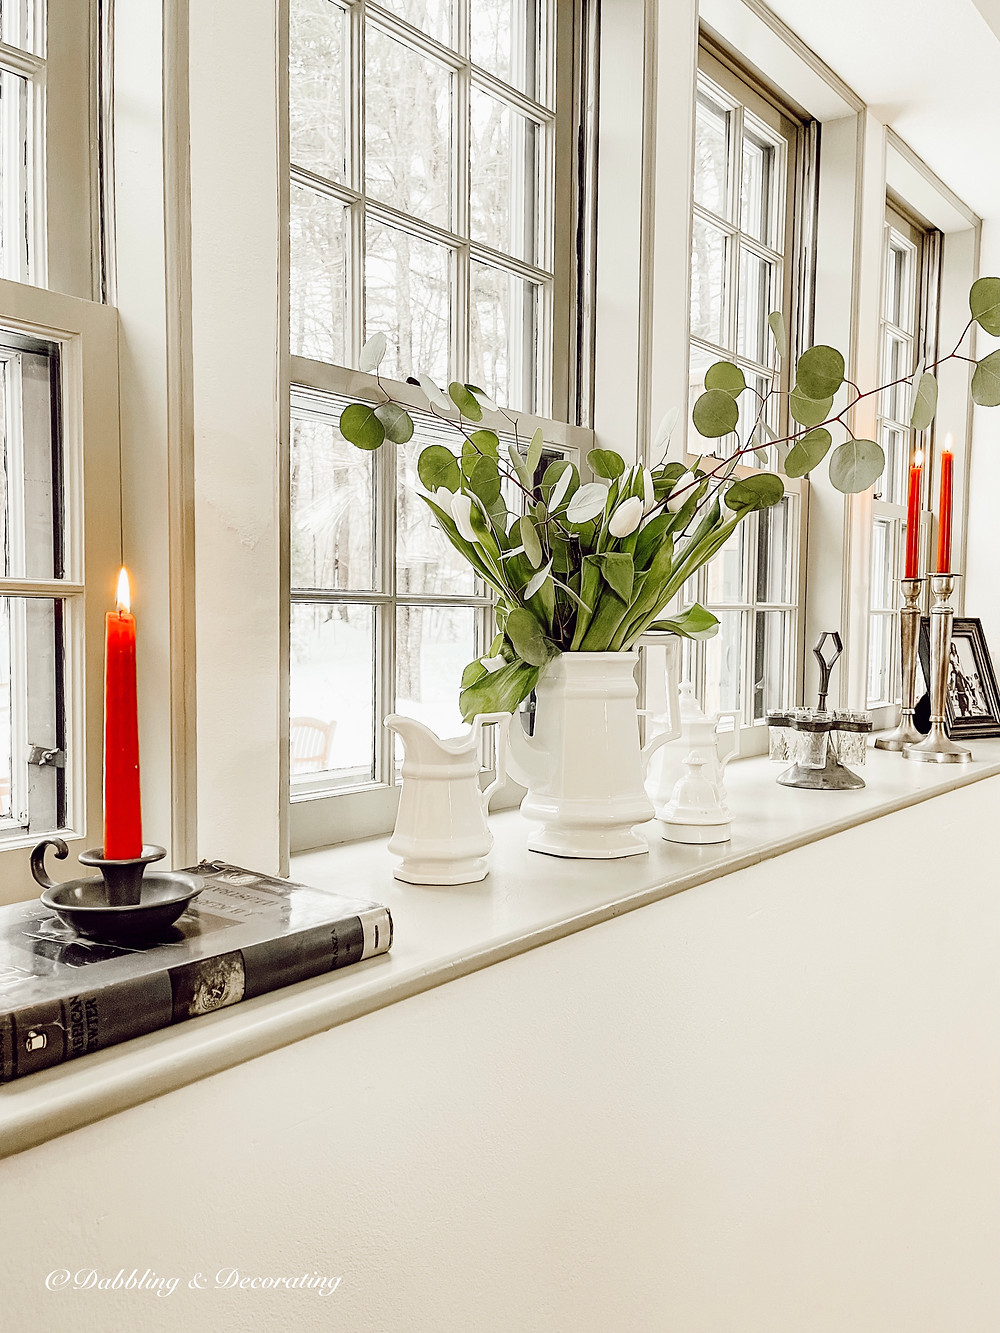 5 Easy Windowsill Decorating Ideas